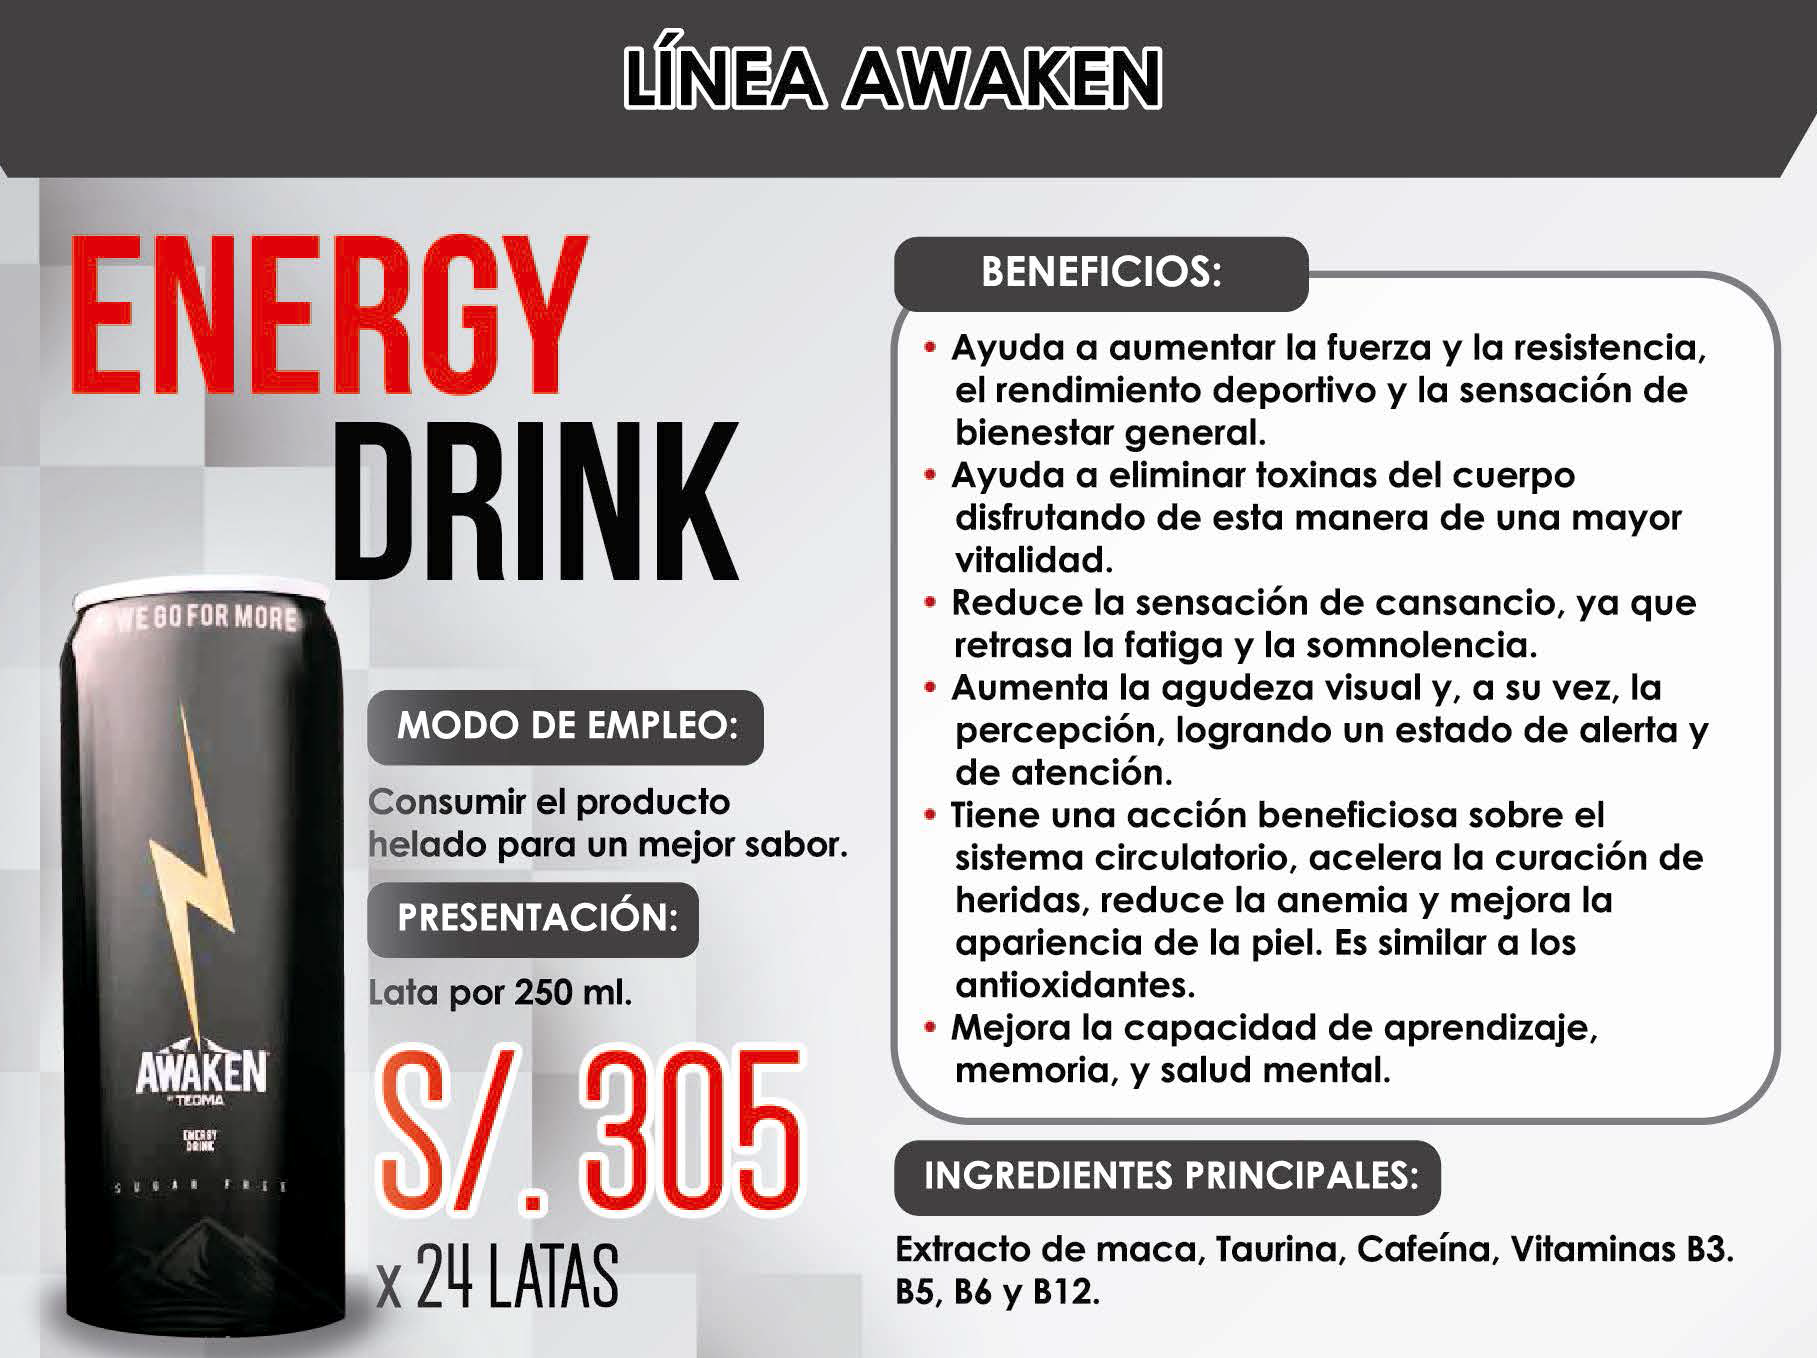 Stir Energy Drink by teoma